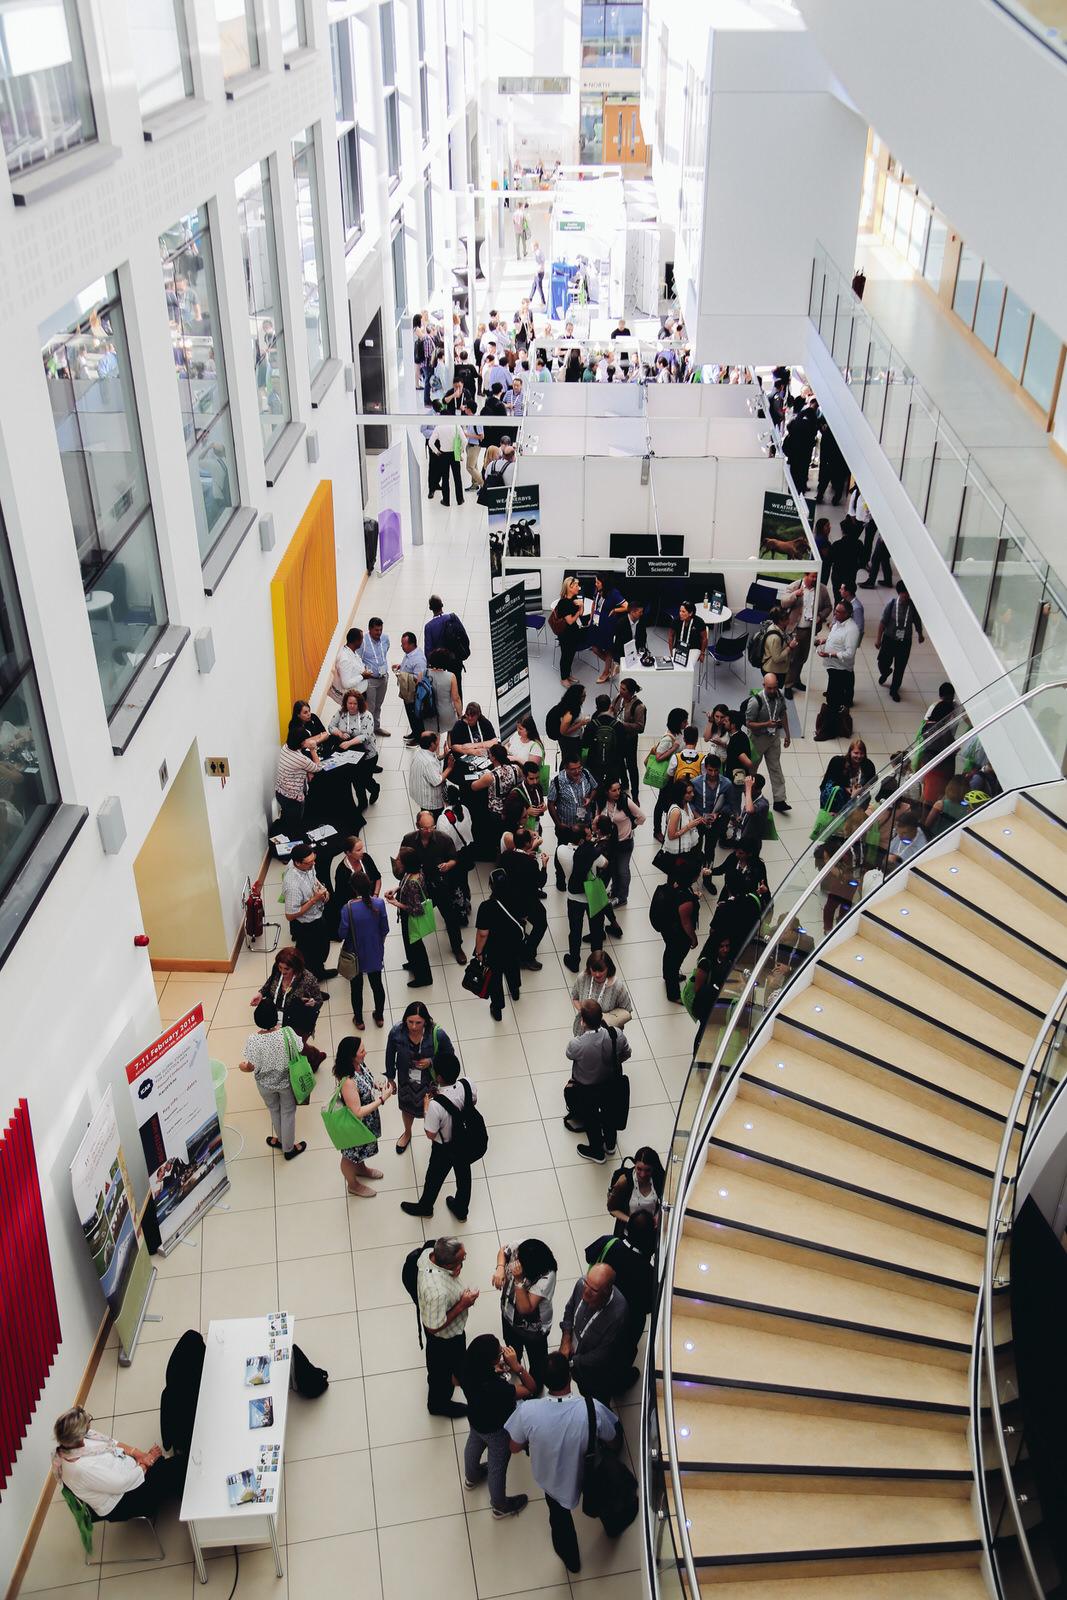 Corporate-conference-photographer-dublin-044.jpg